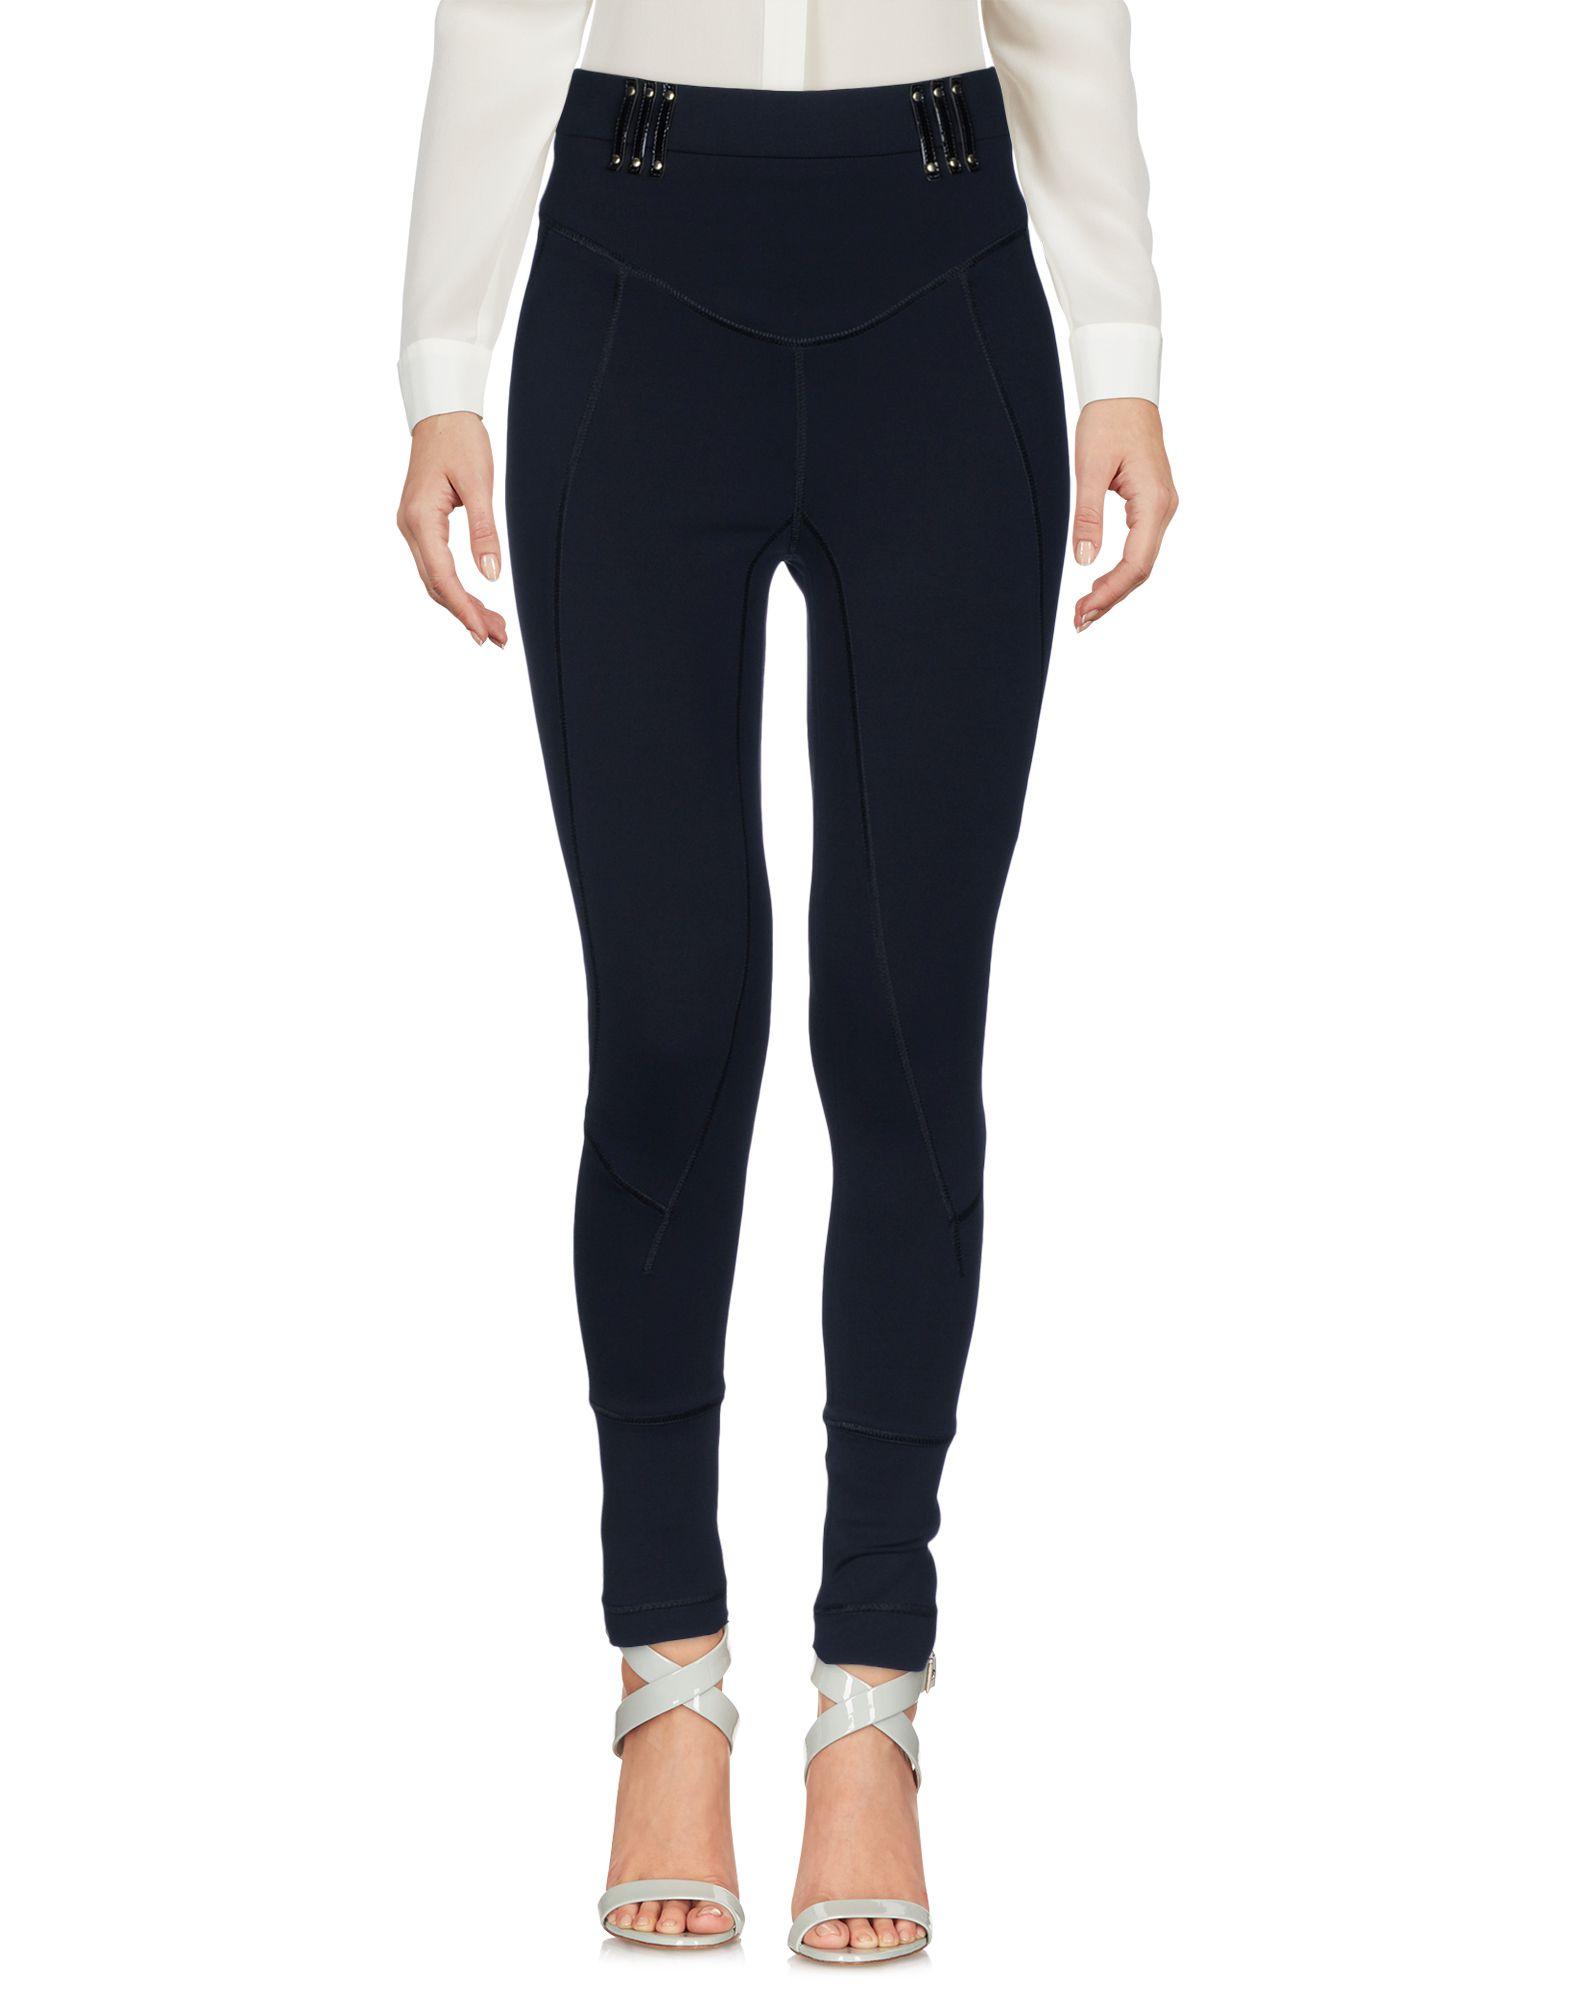 Pantalone Fay Donna - Acquista online su LHIdUI